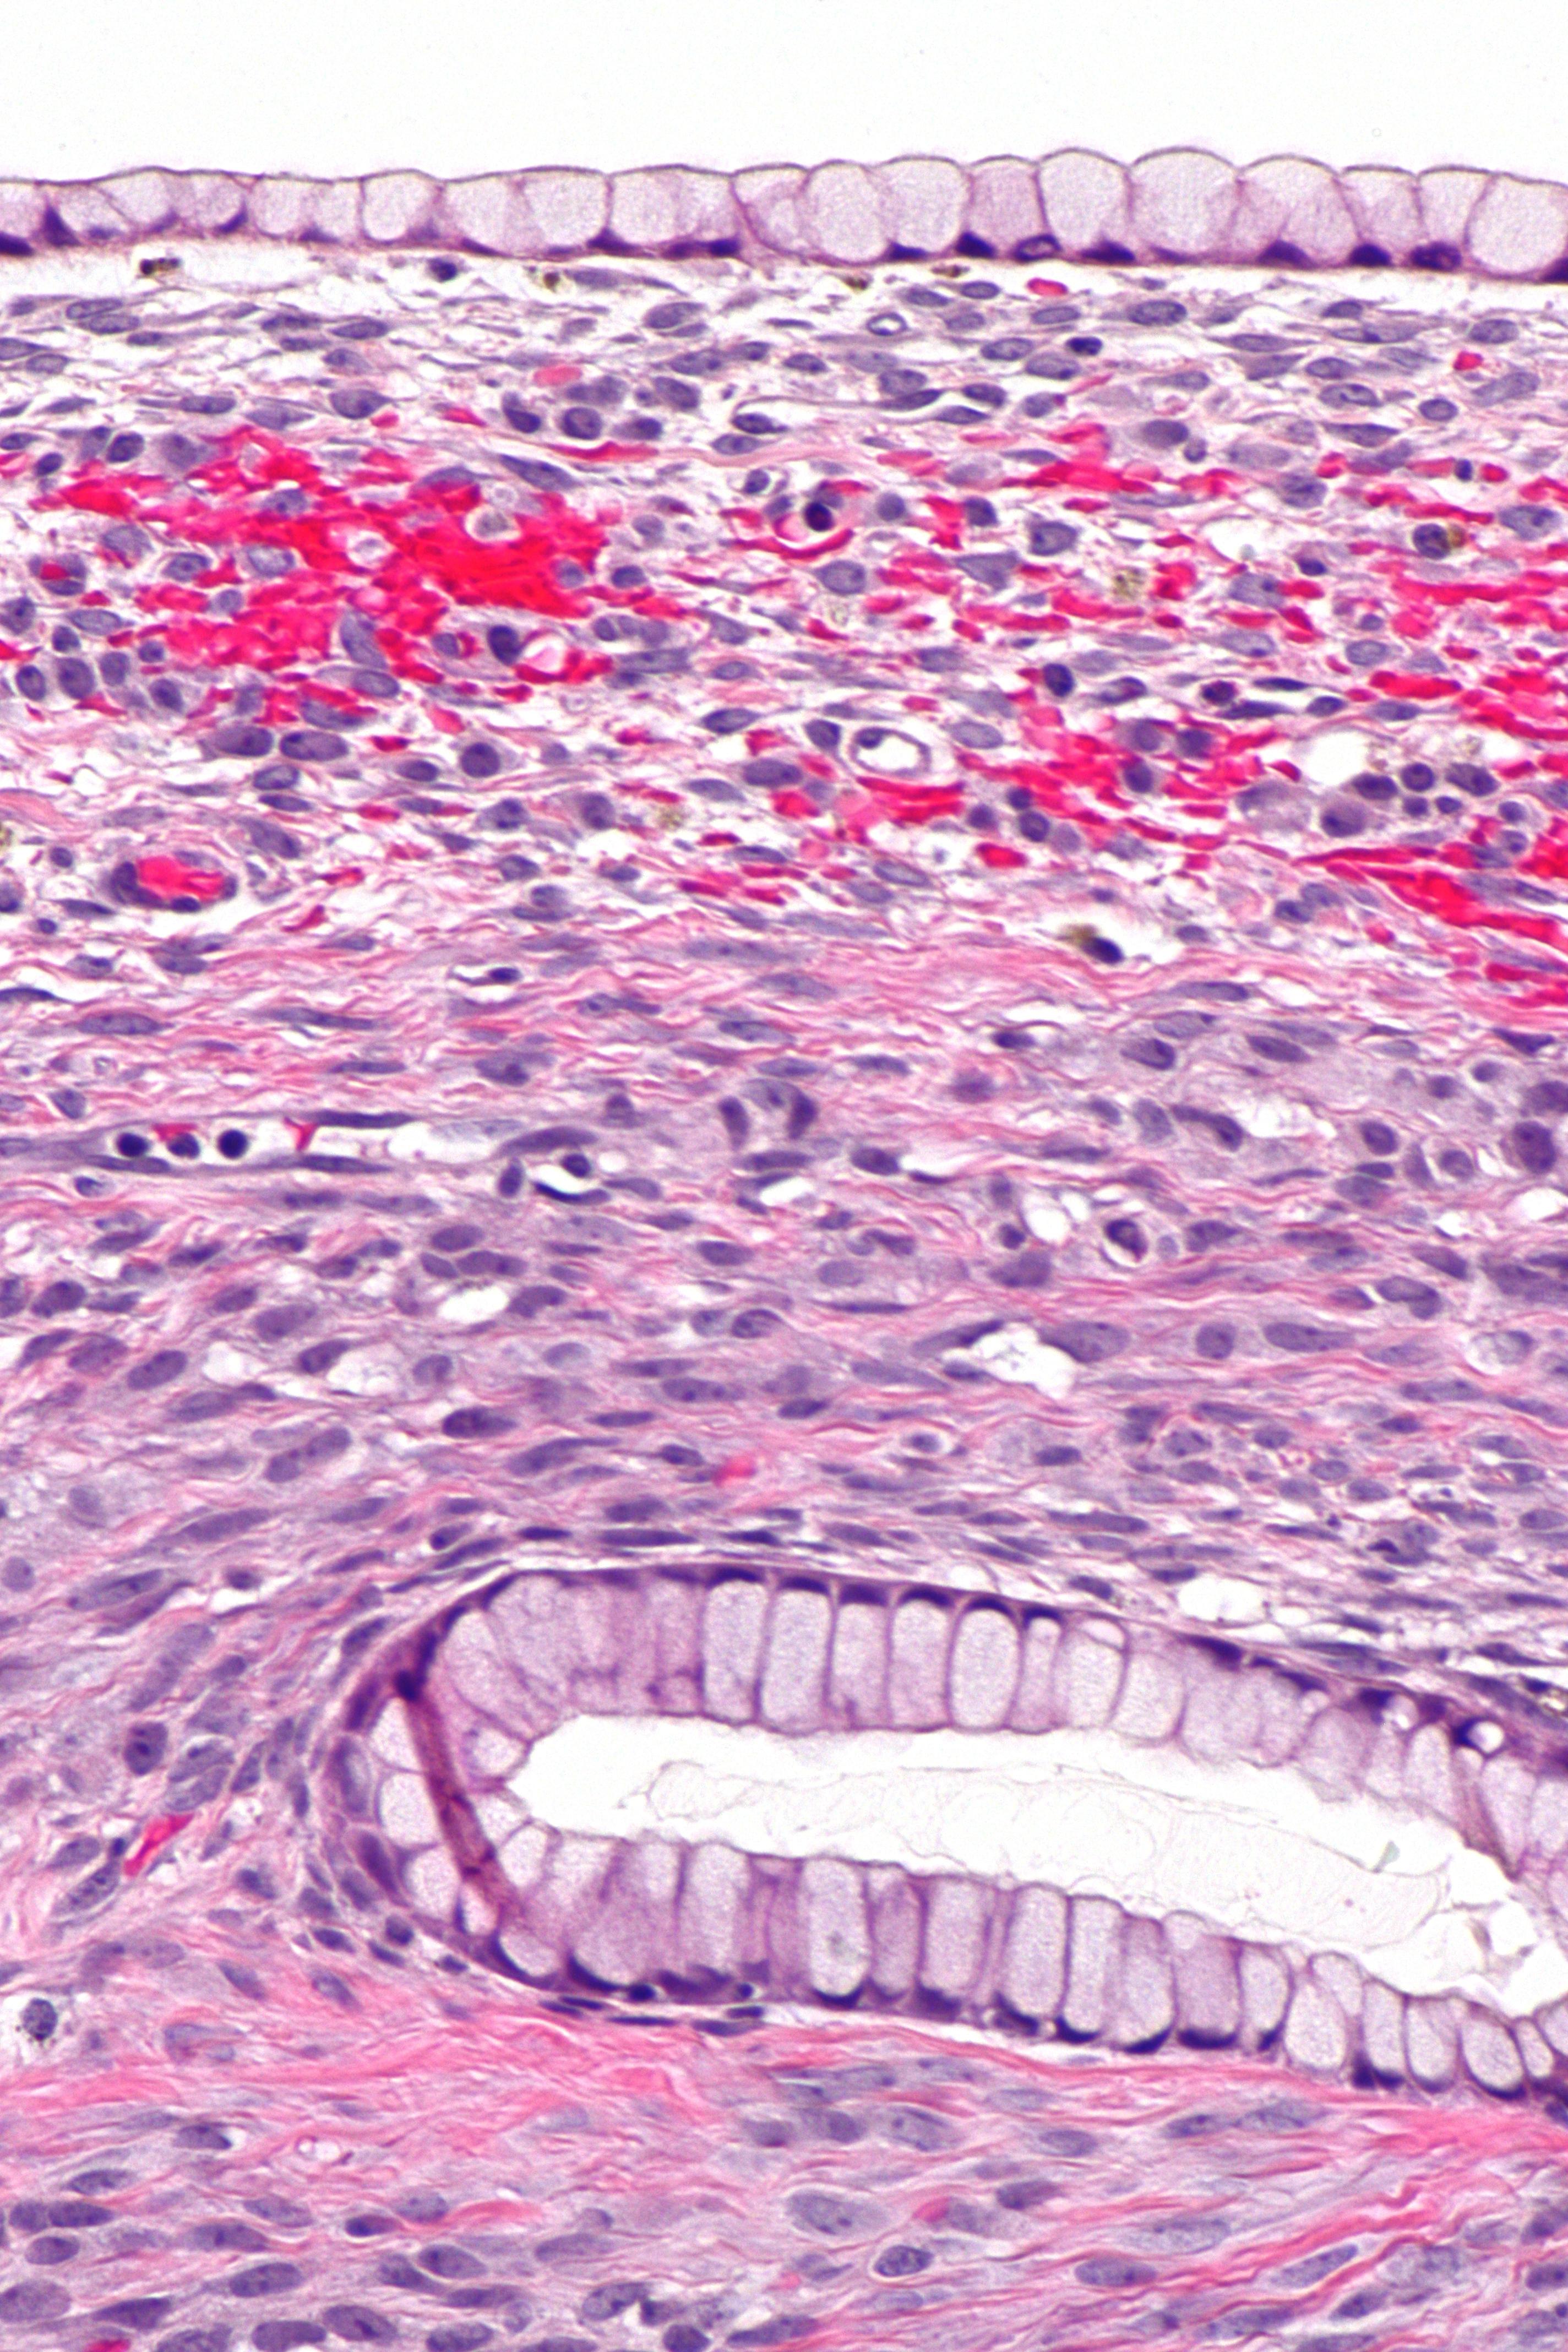 ovarian cancer znaczenie papilloma definition medical